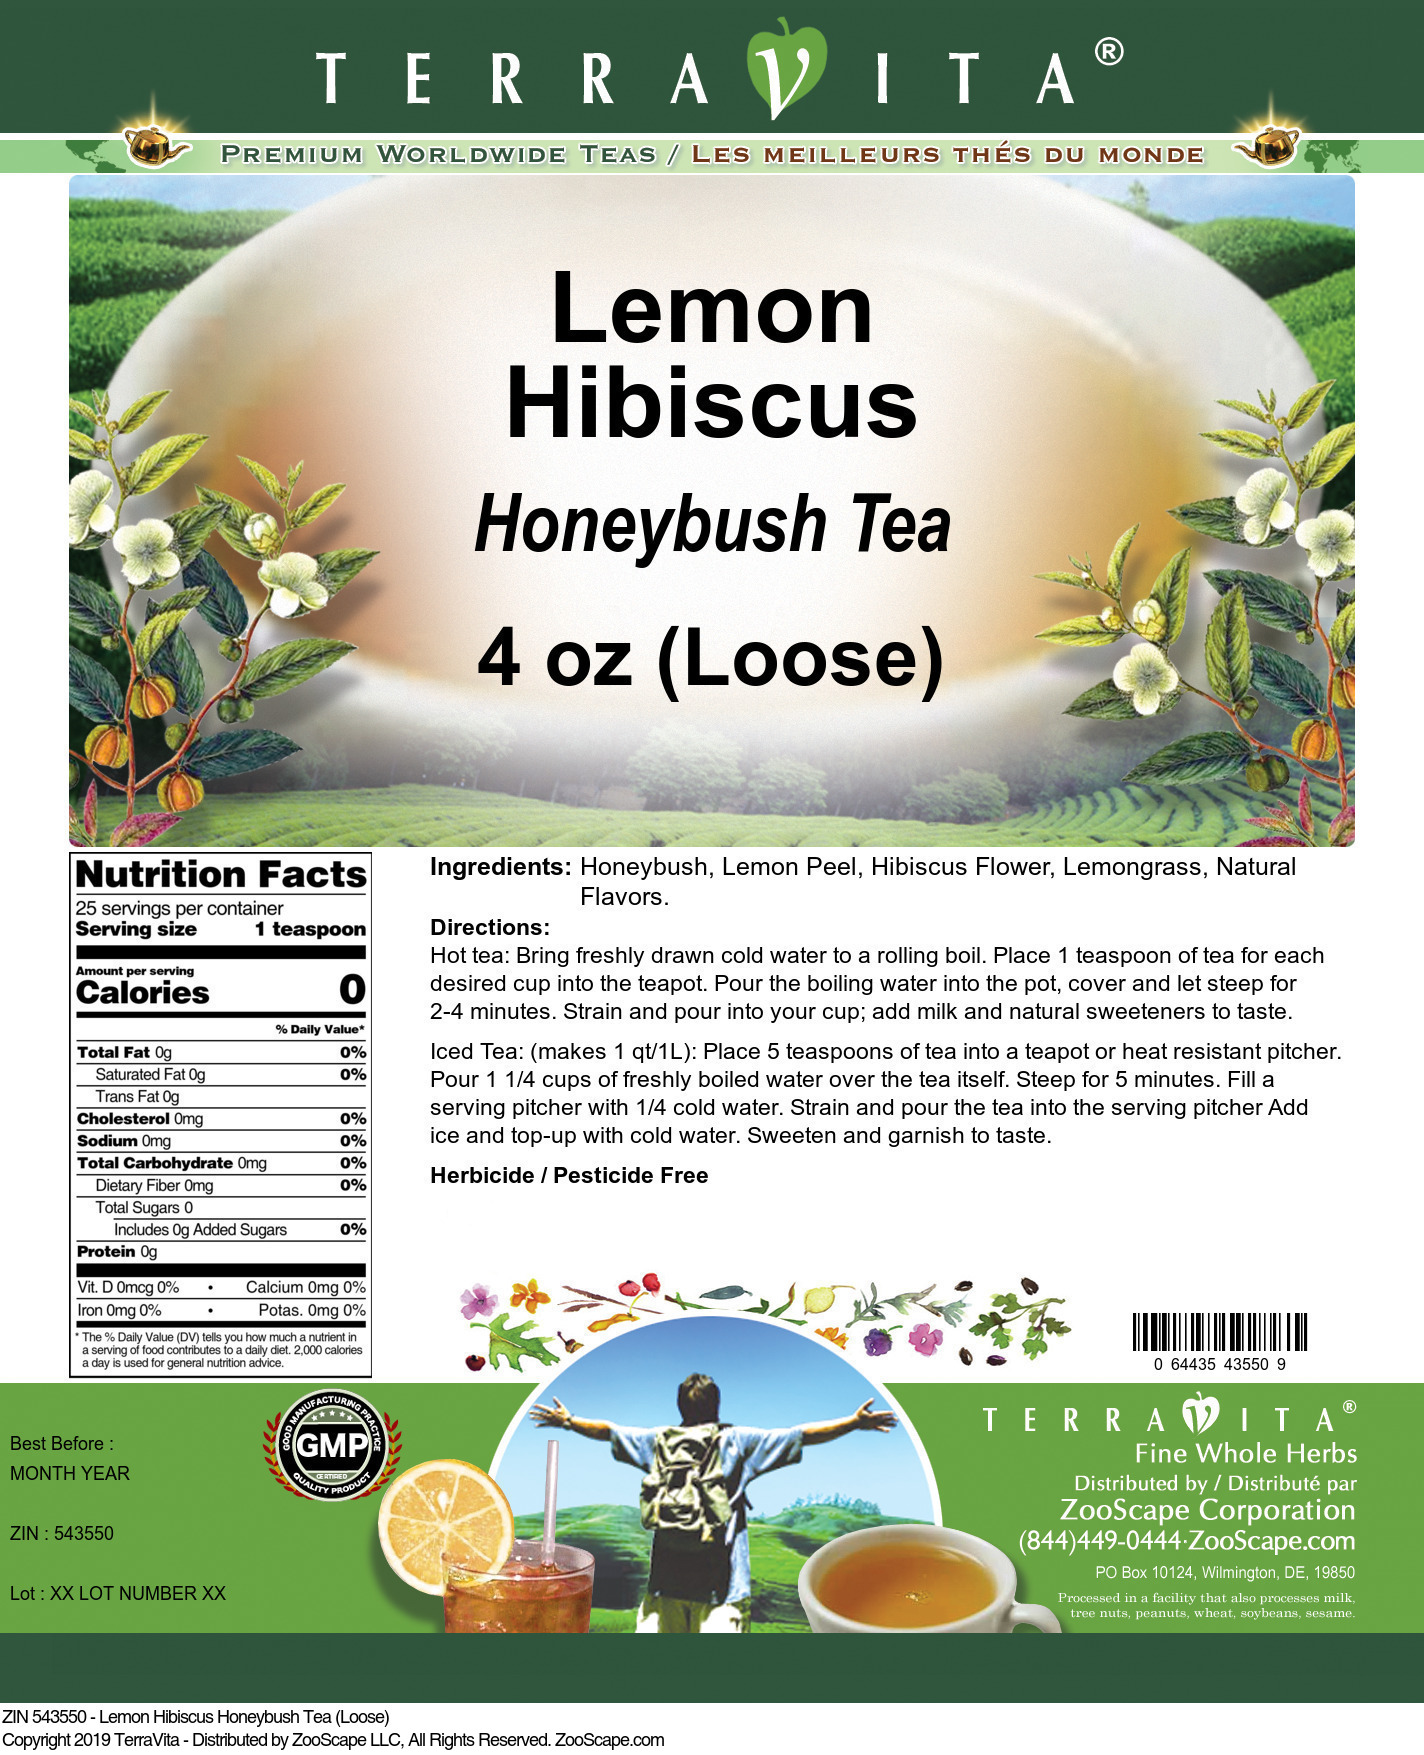 Lemon Hibiscus Honeybush Tea (Loose)